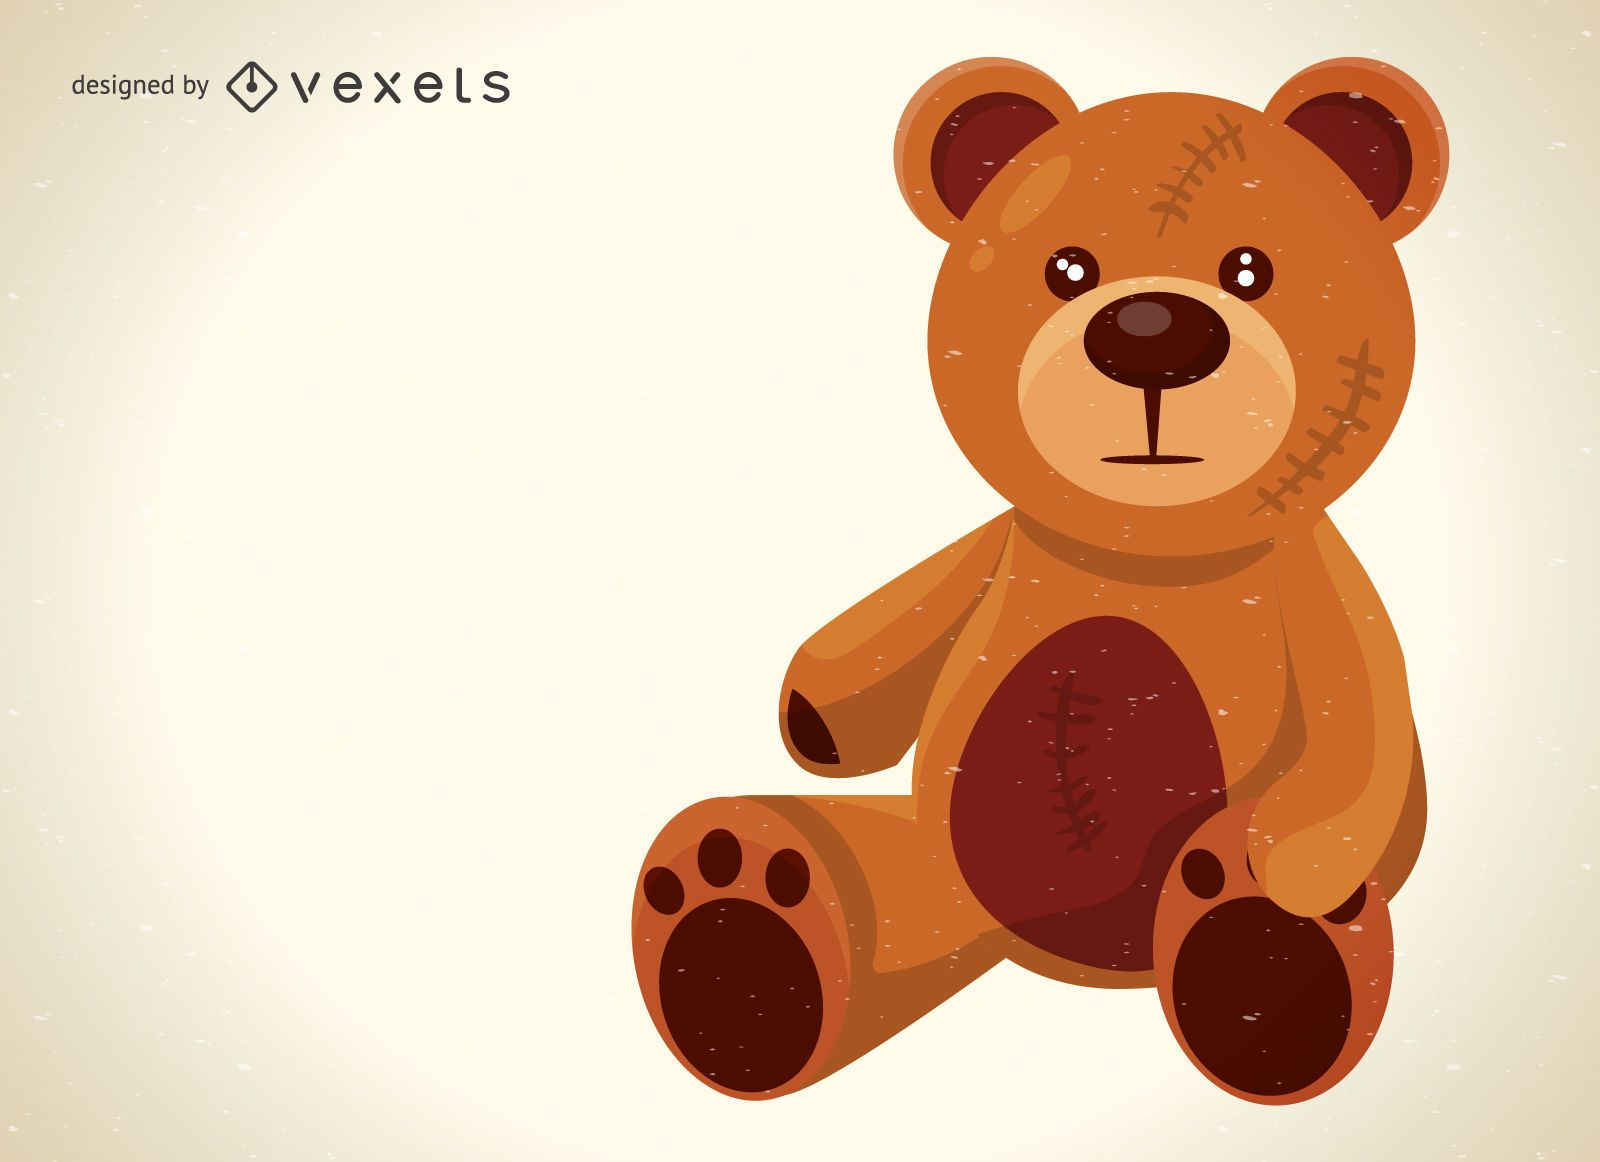 Cute teddy bear illustration